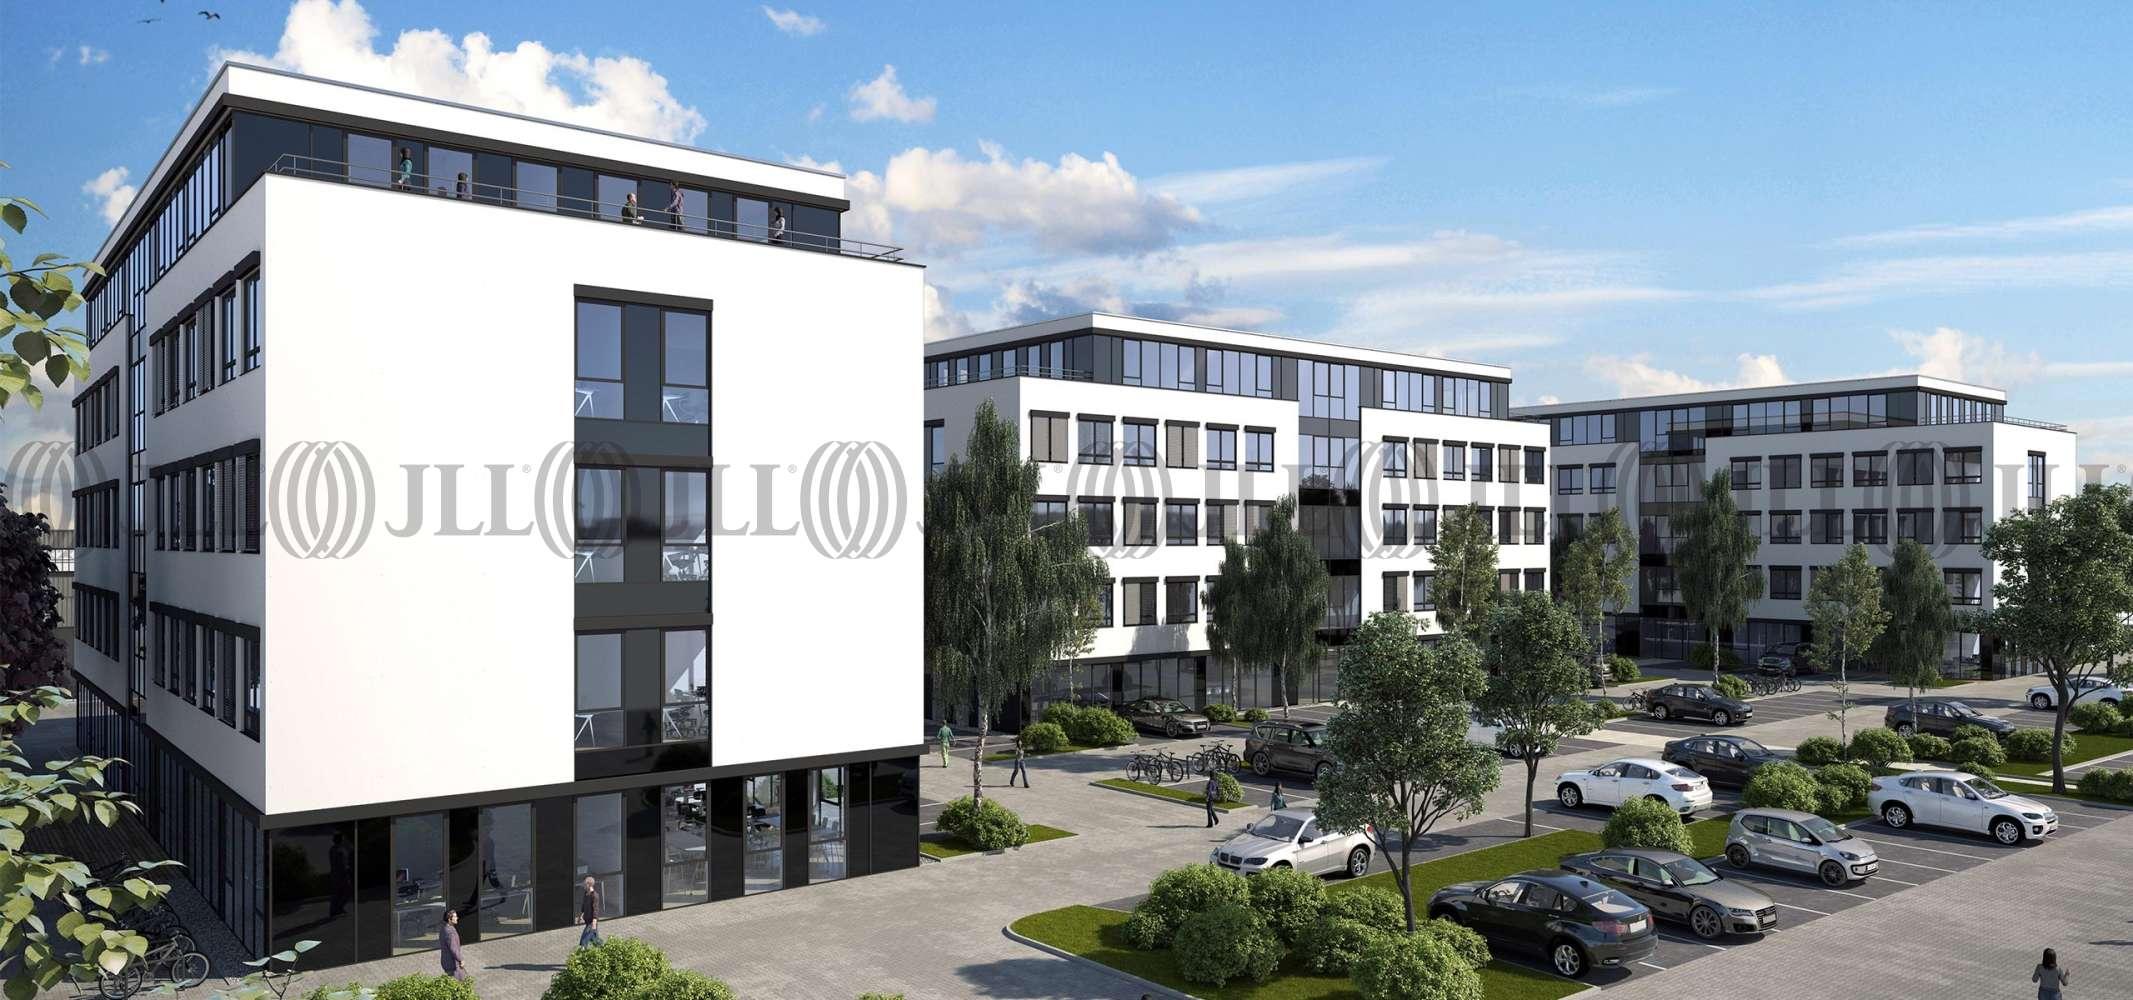 Büros Nürnberg, 90409 - Büro - Nürnberg, Großreuth h d Veste - M1504 - 10804678